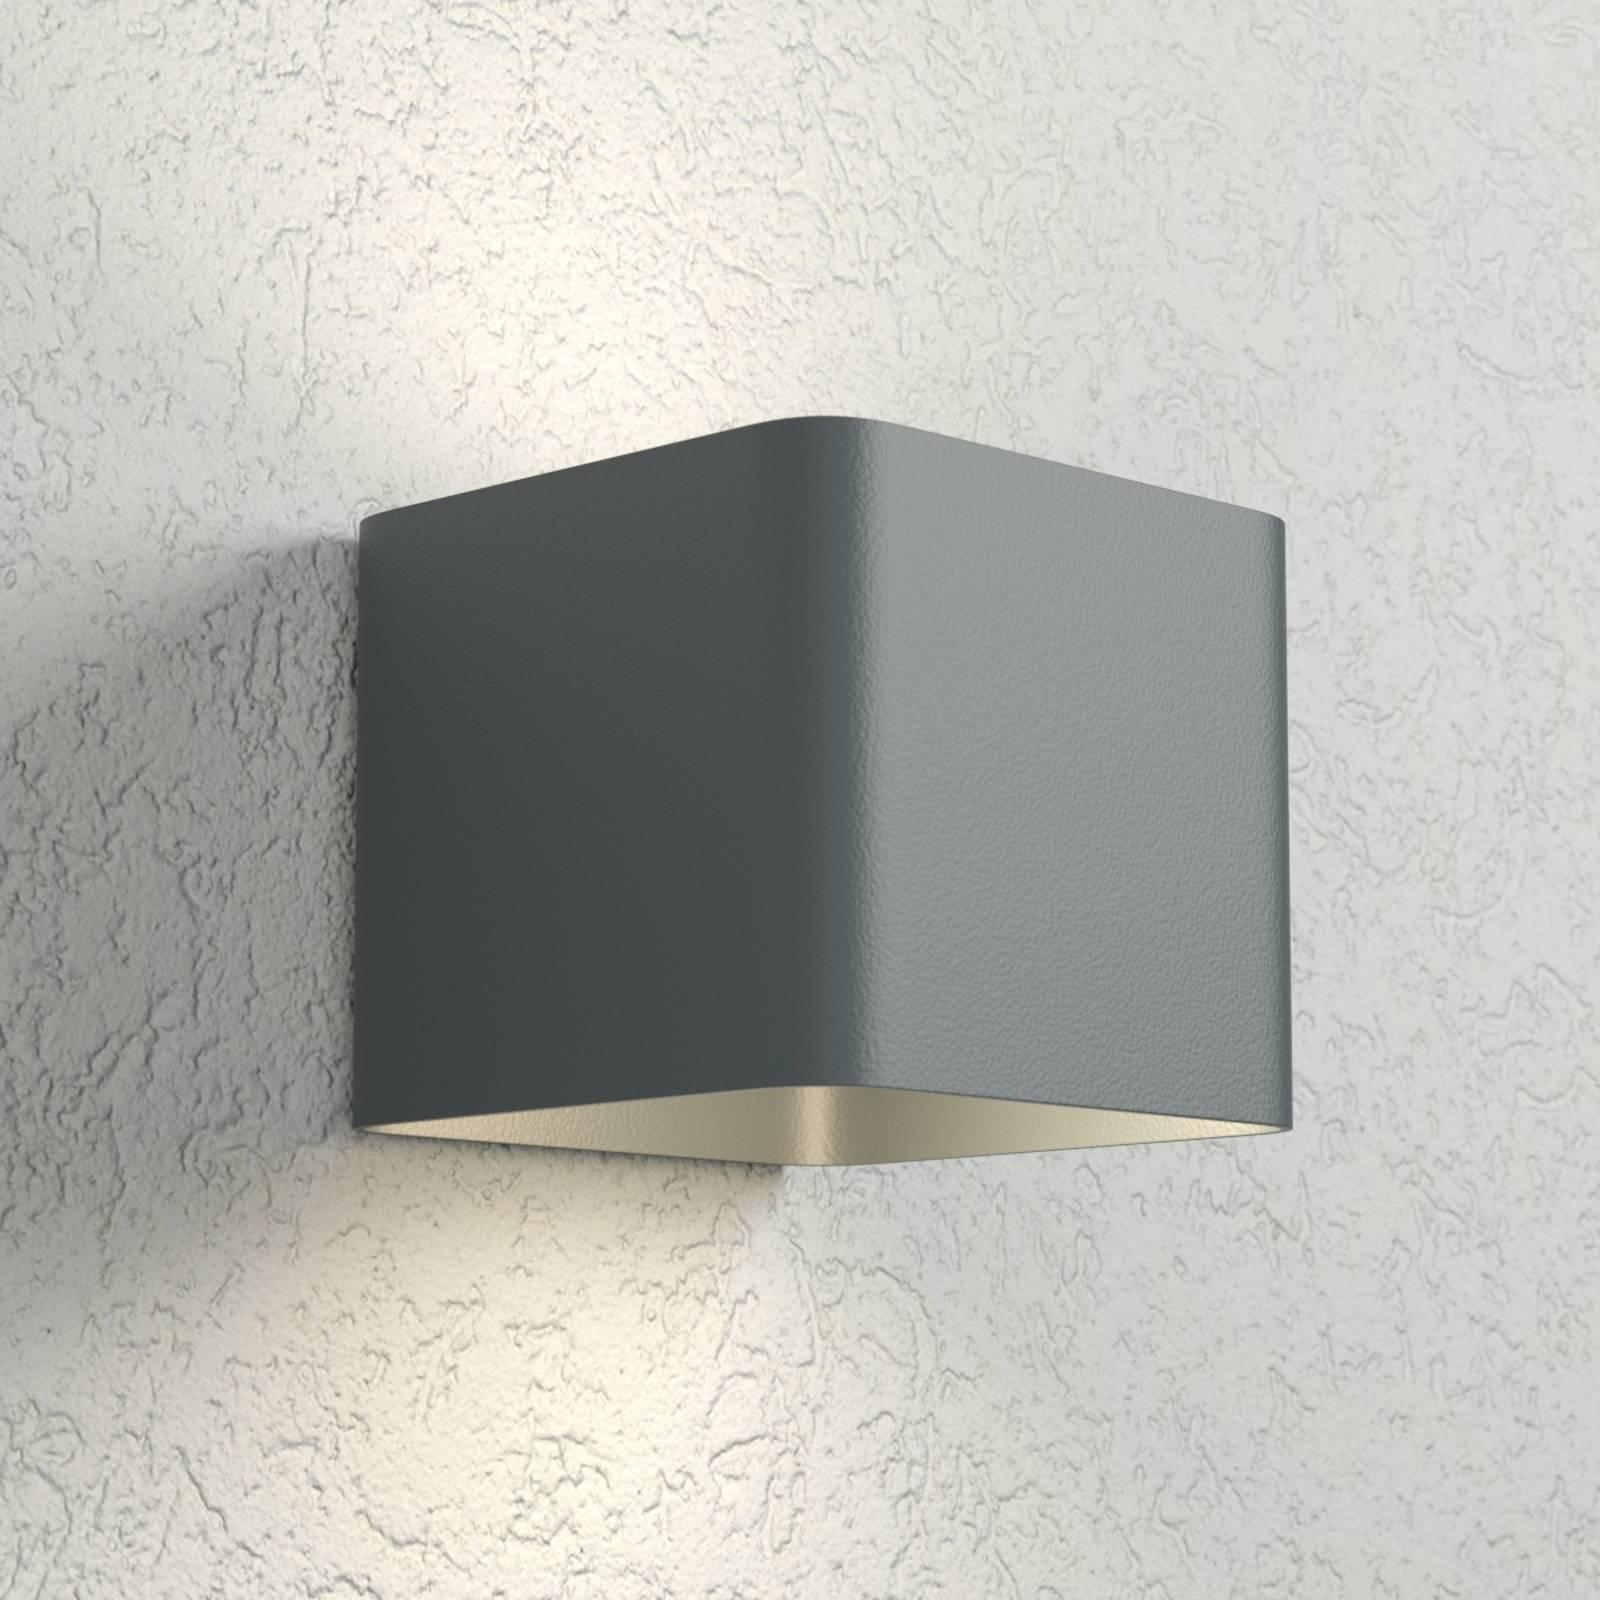 Antracietkleurige LED wandlamp Dodd